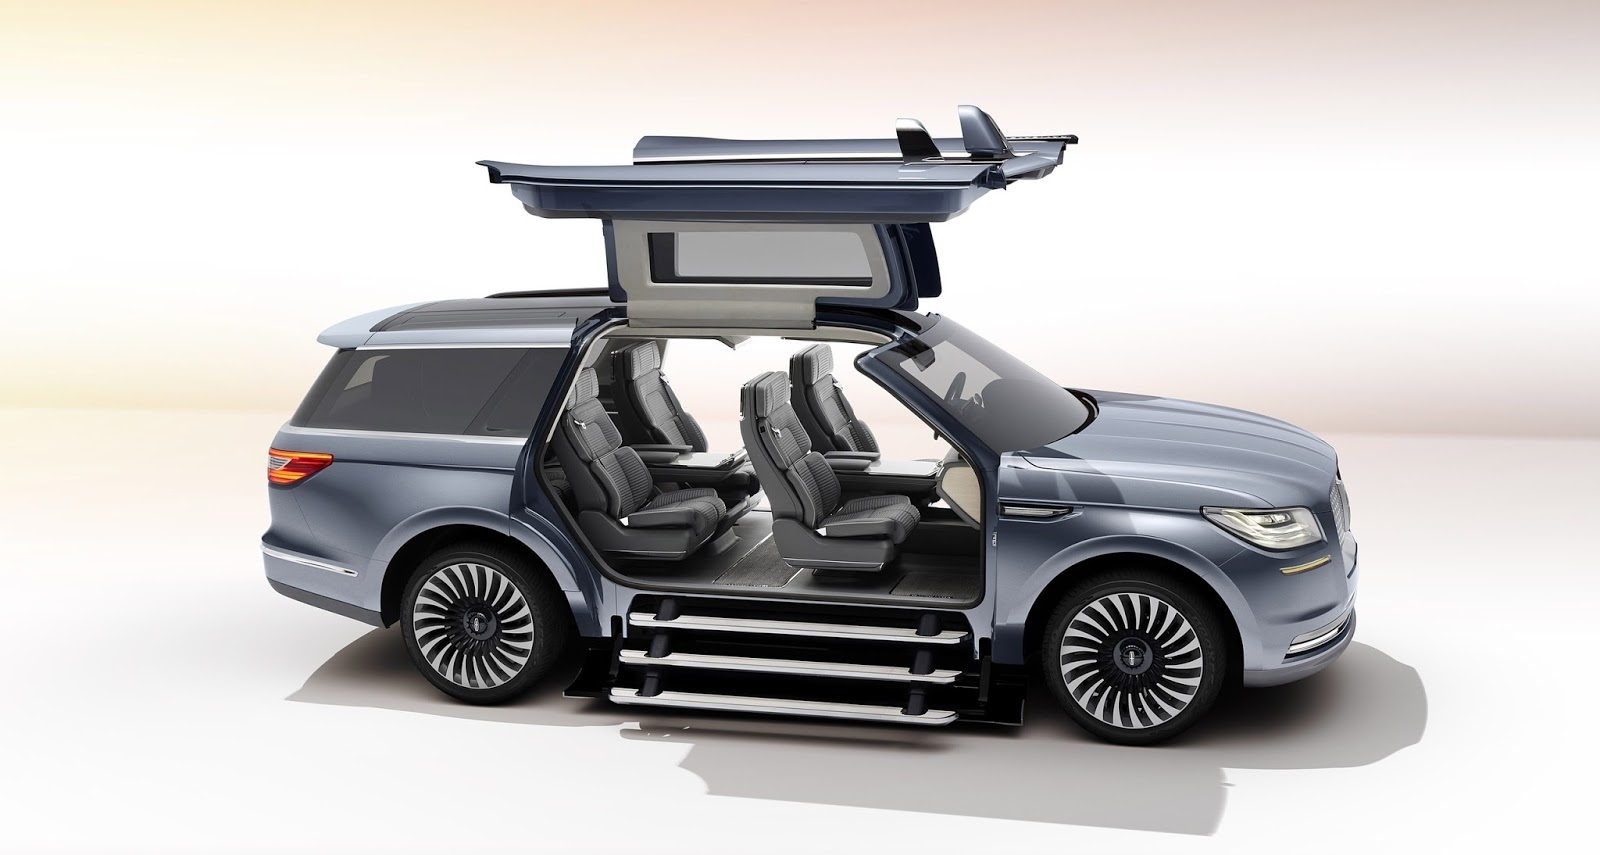 ford lincoln navigator concept ford lincoln navigator concept 2017 2018 best cars reviews. Black Bedroom Furniture Sets. Home Design Ideas